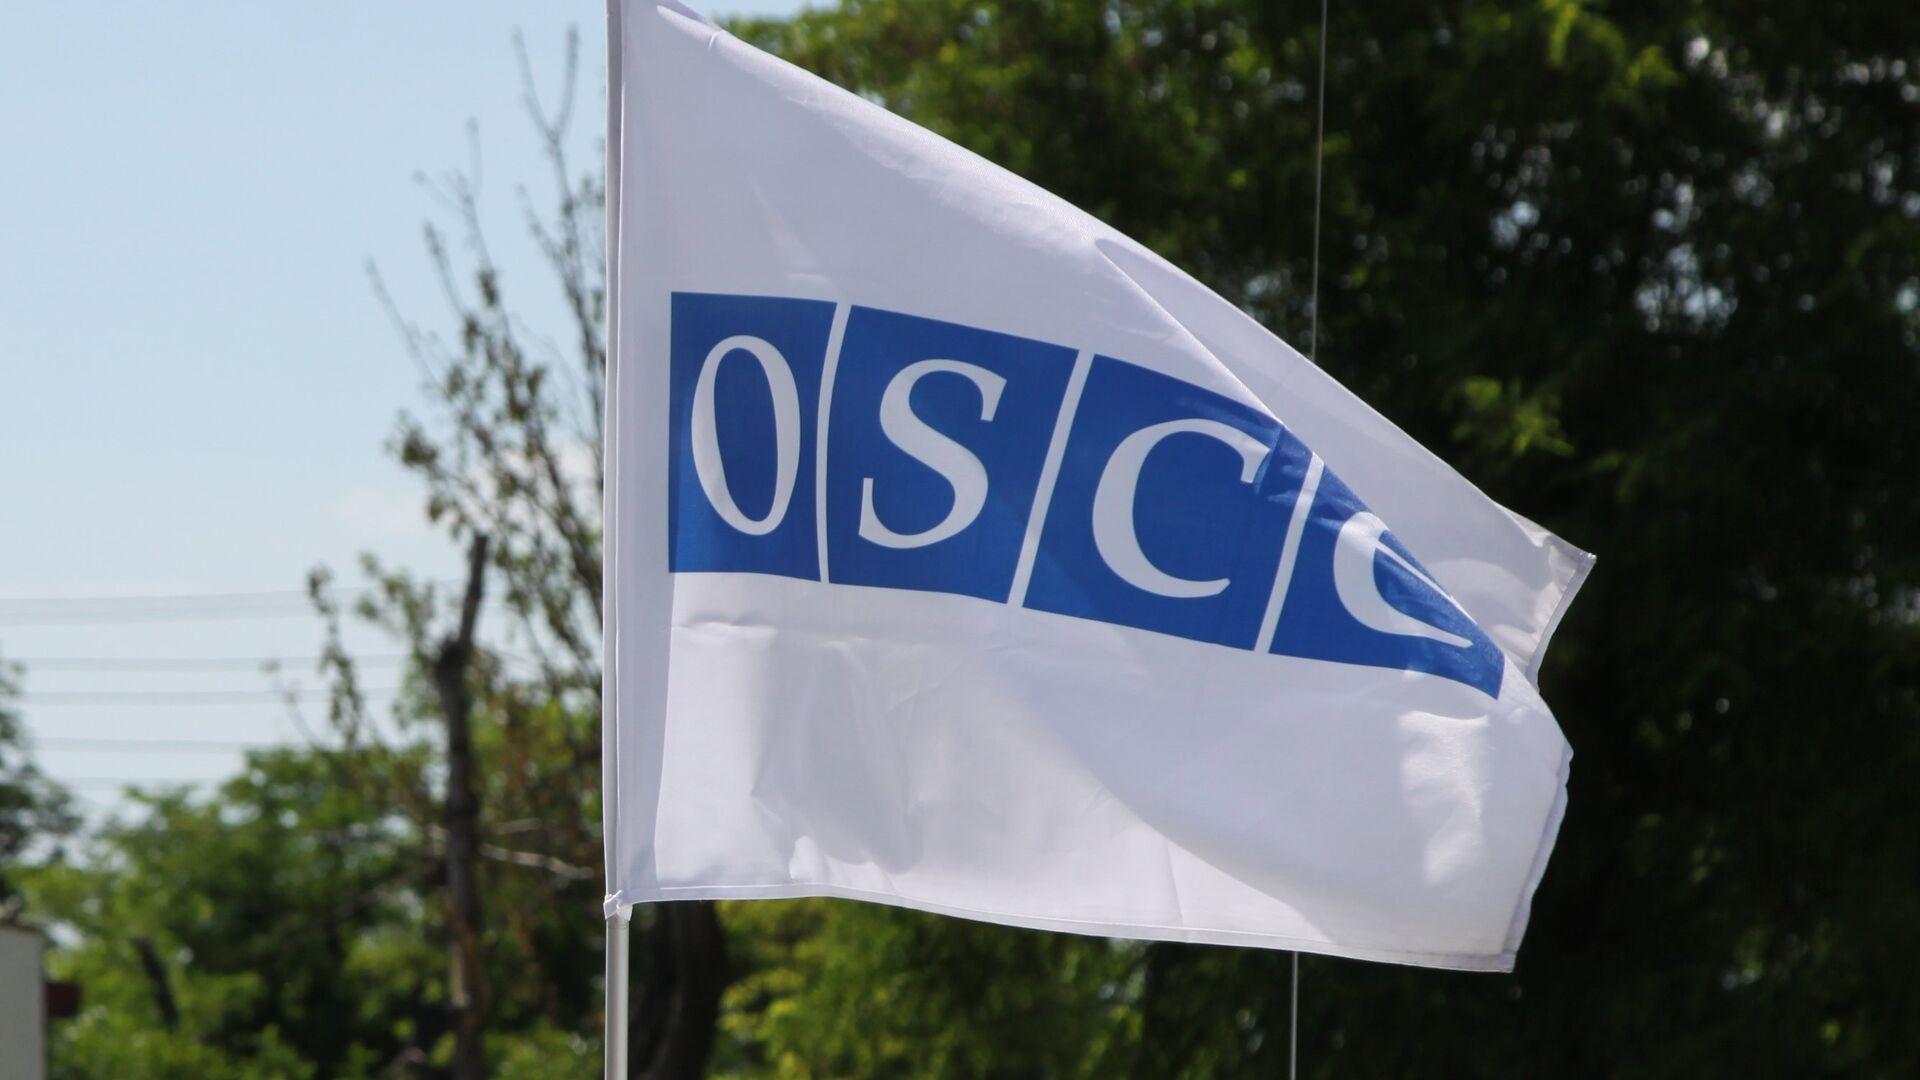 La bandera de la OSCE en Donbás - Sputnik Mundo, 1920, 01.04.2021